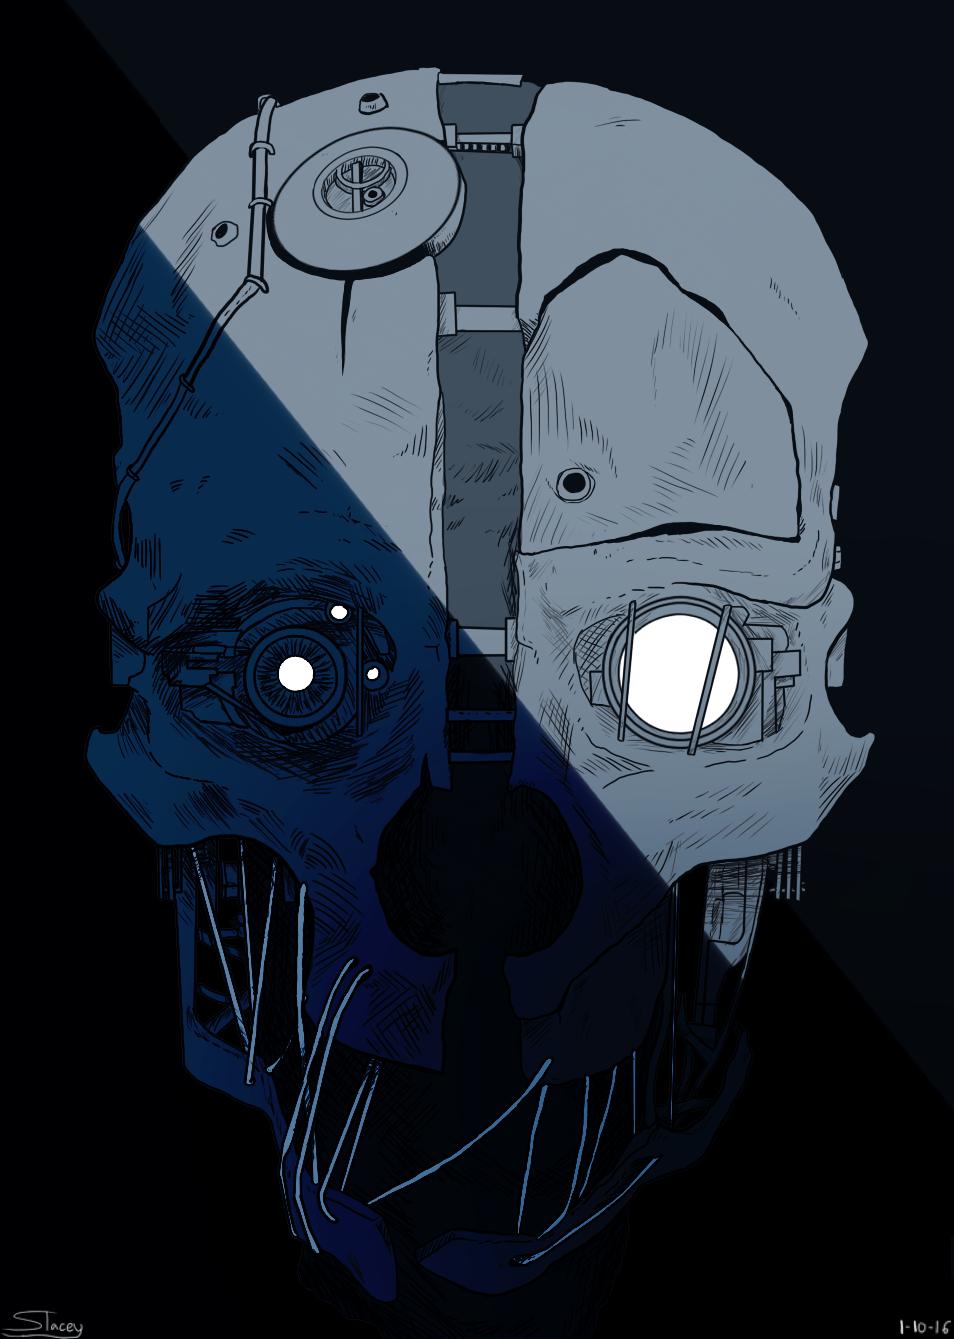 [DH] Corvo Attano Mask Nerd Stuff, Dishonored Mask, Game Art, Clip